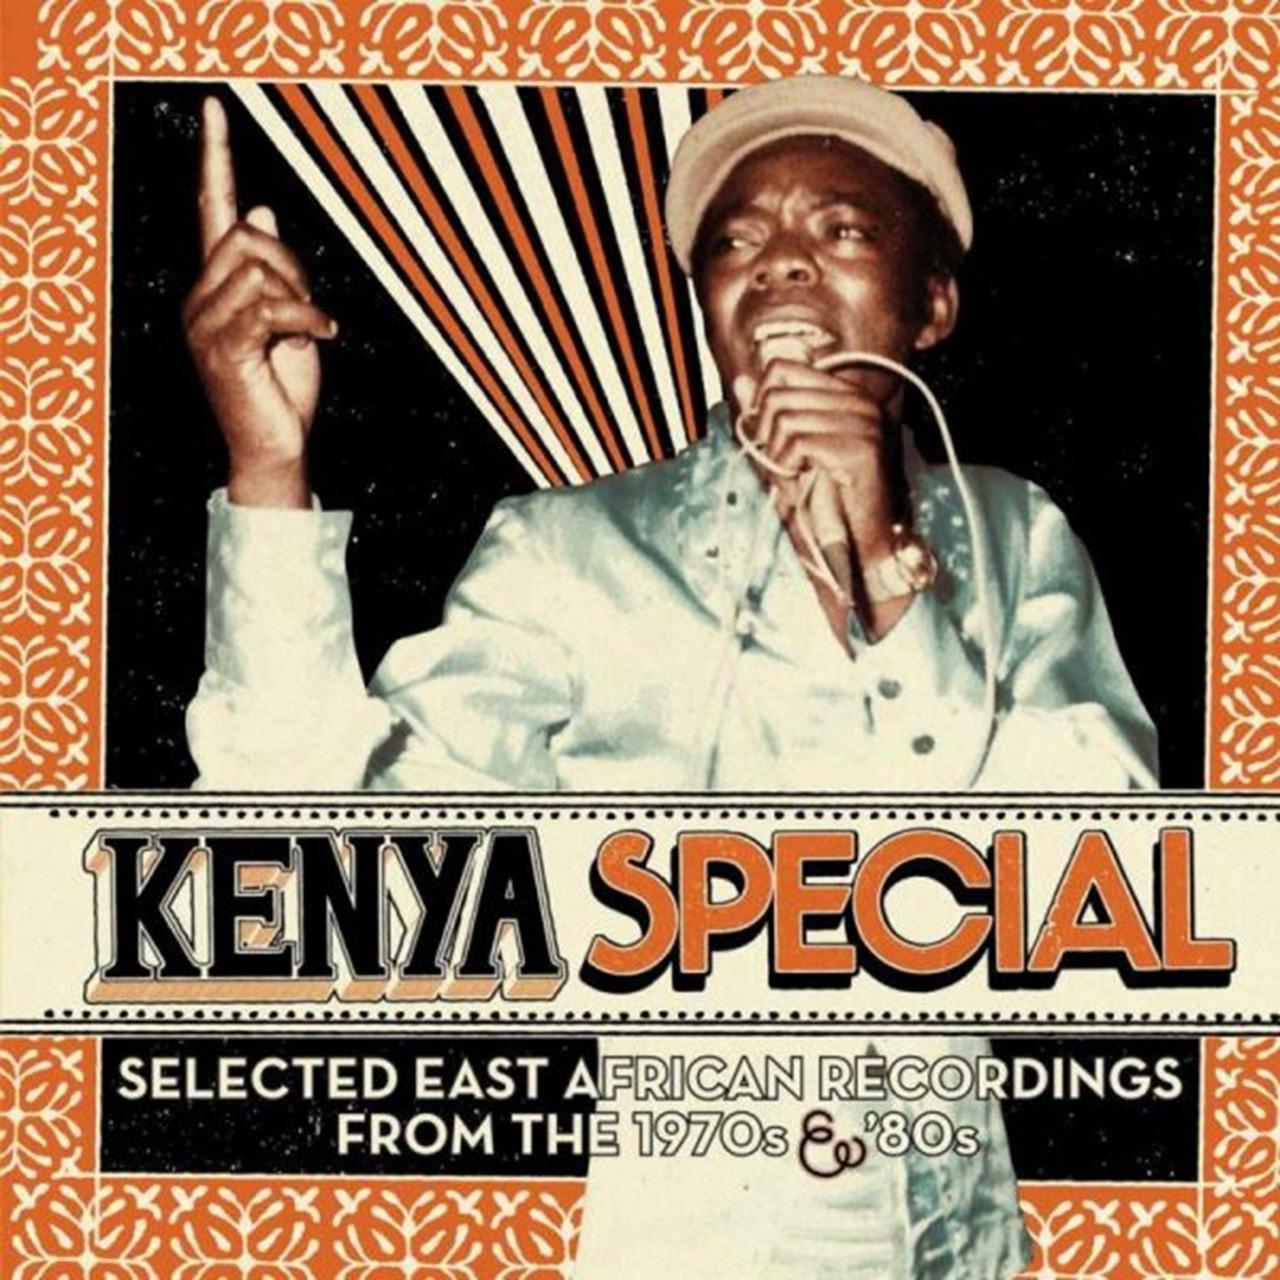 Kenya Special - 1